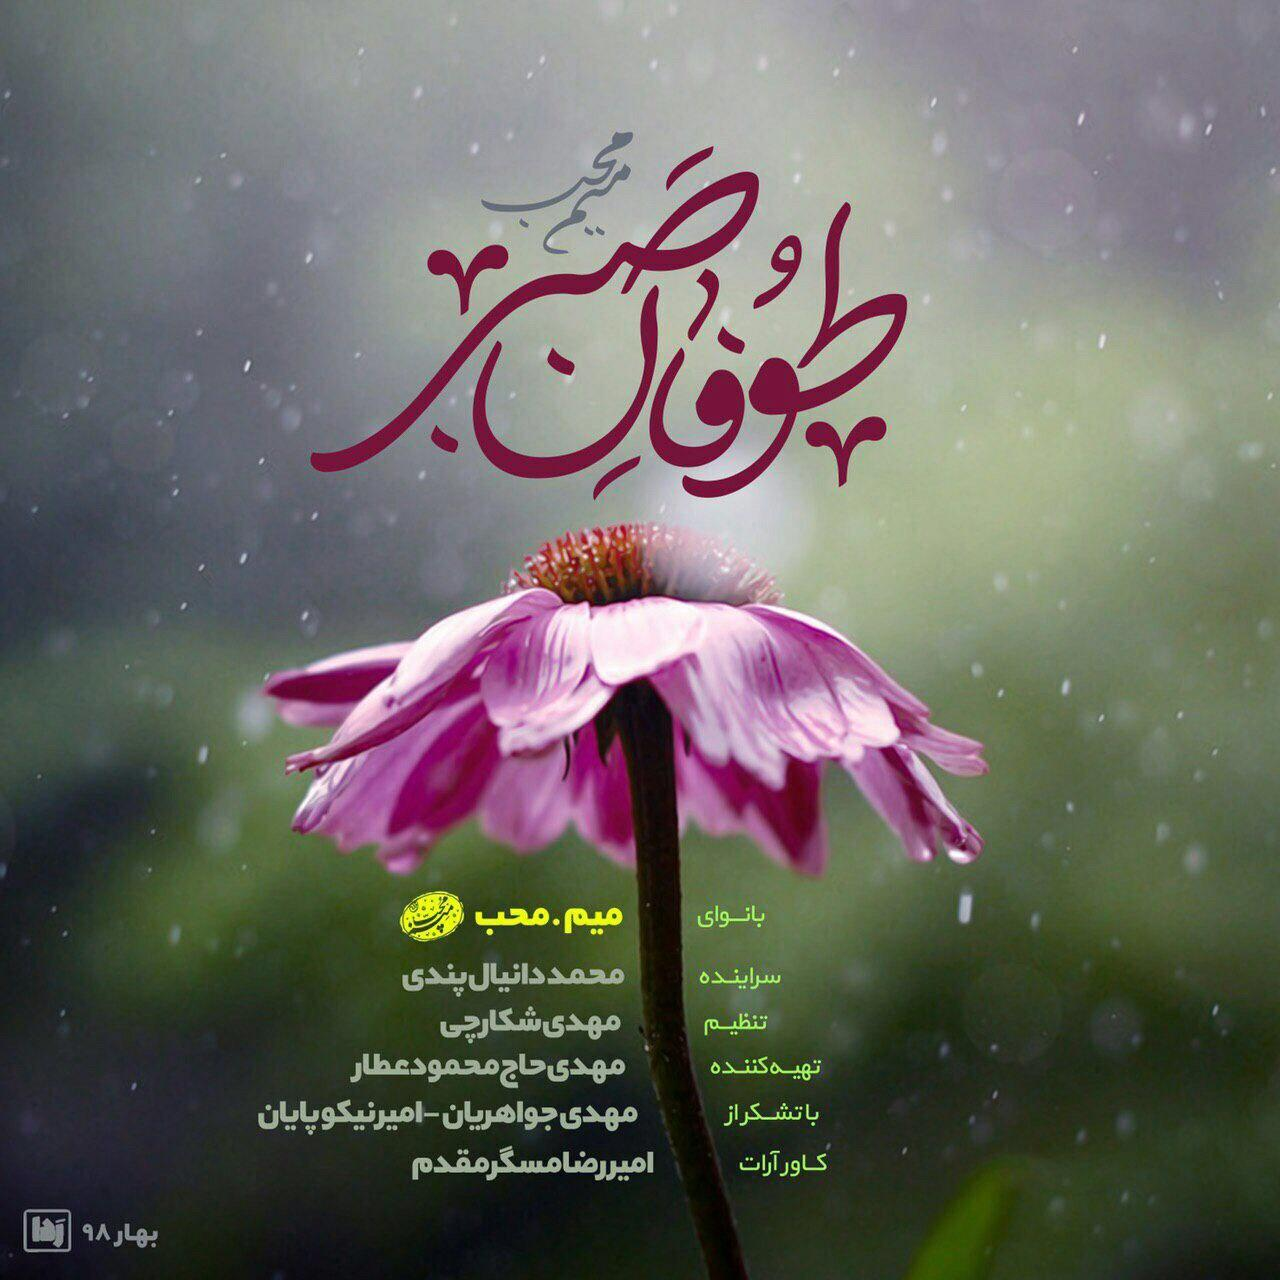 قطعهی صوتی «طوفان صبر» به مناسبت ولادت امام حسن علیه السلام